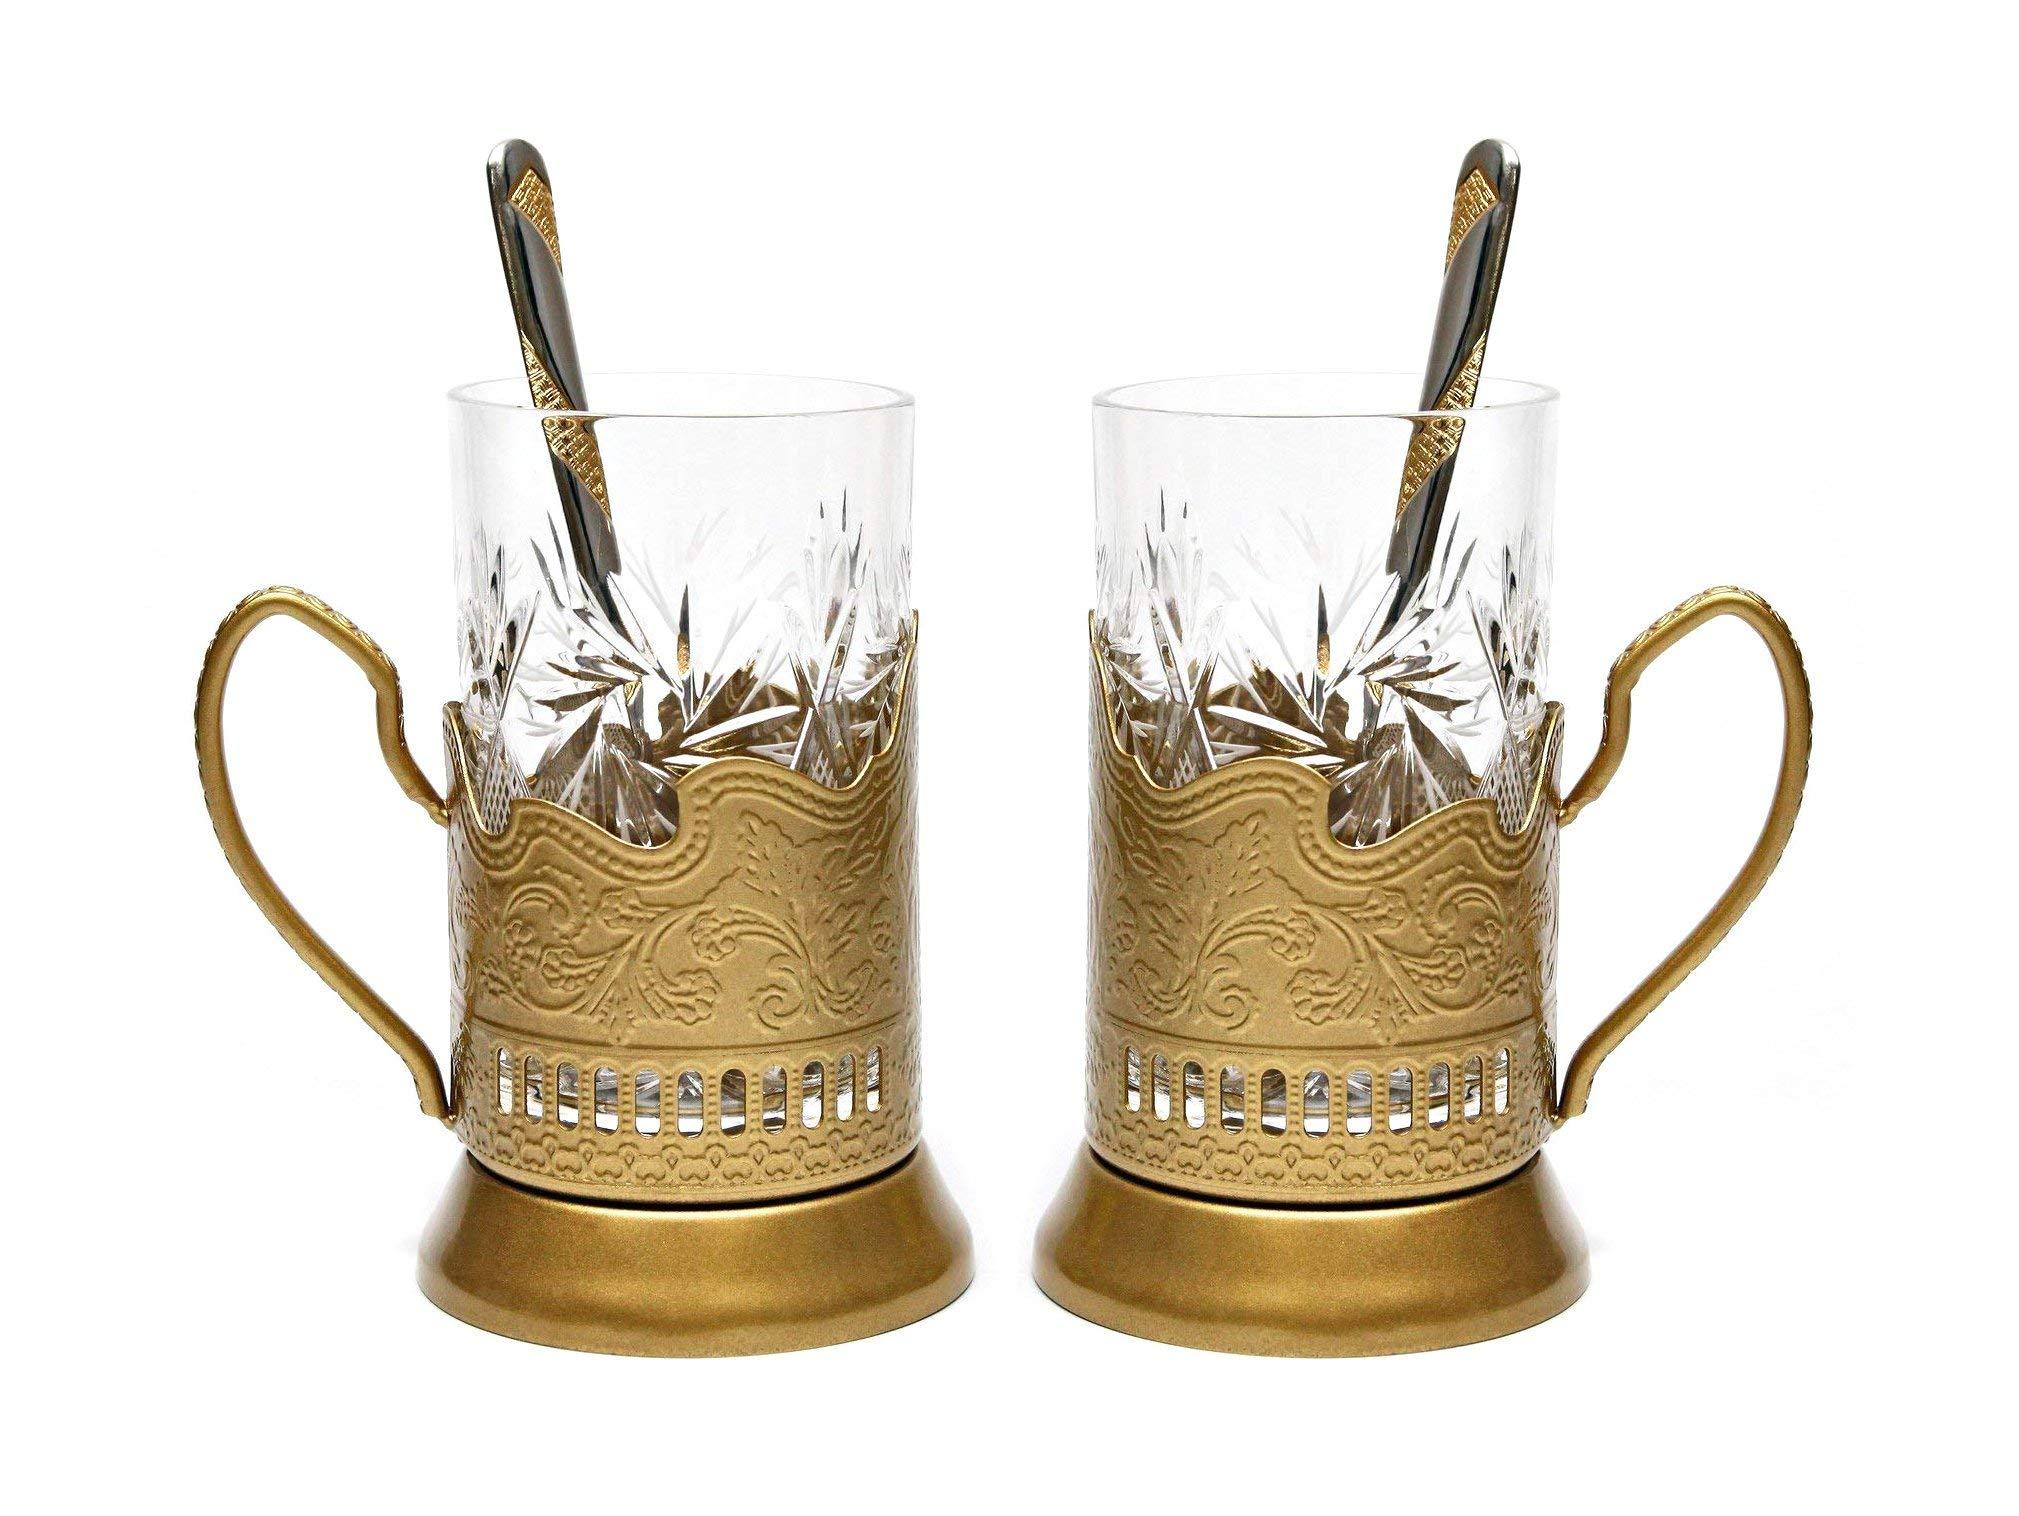 Belarus Gold Combination of 2 Russian Old-Fashioned Cut Crystal Hot Tea Glass 8.5 Oz & Handmade Metal Glass Holder Podstakannik w/Gold-Plated Teaspoon, Vintage Hot or Cold Beverage Drinking Set